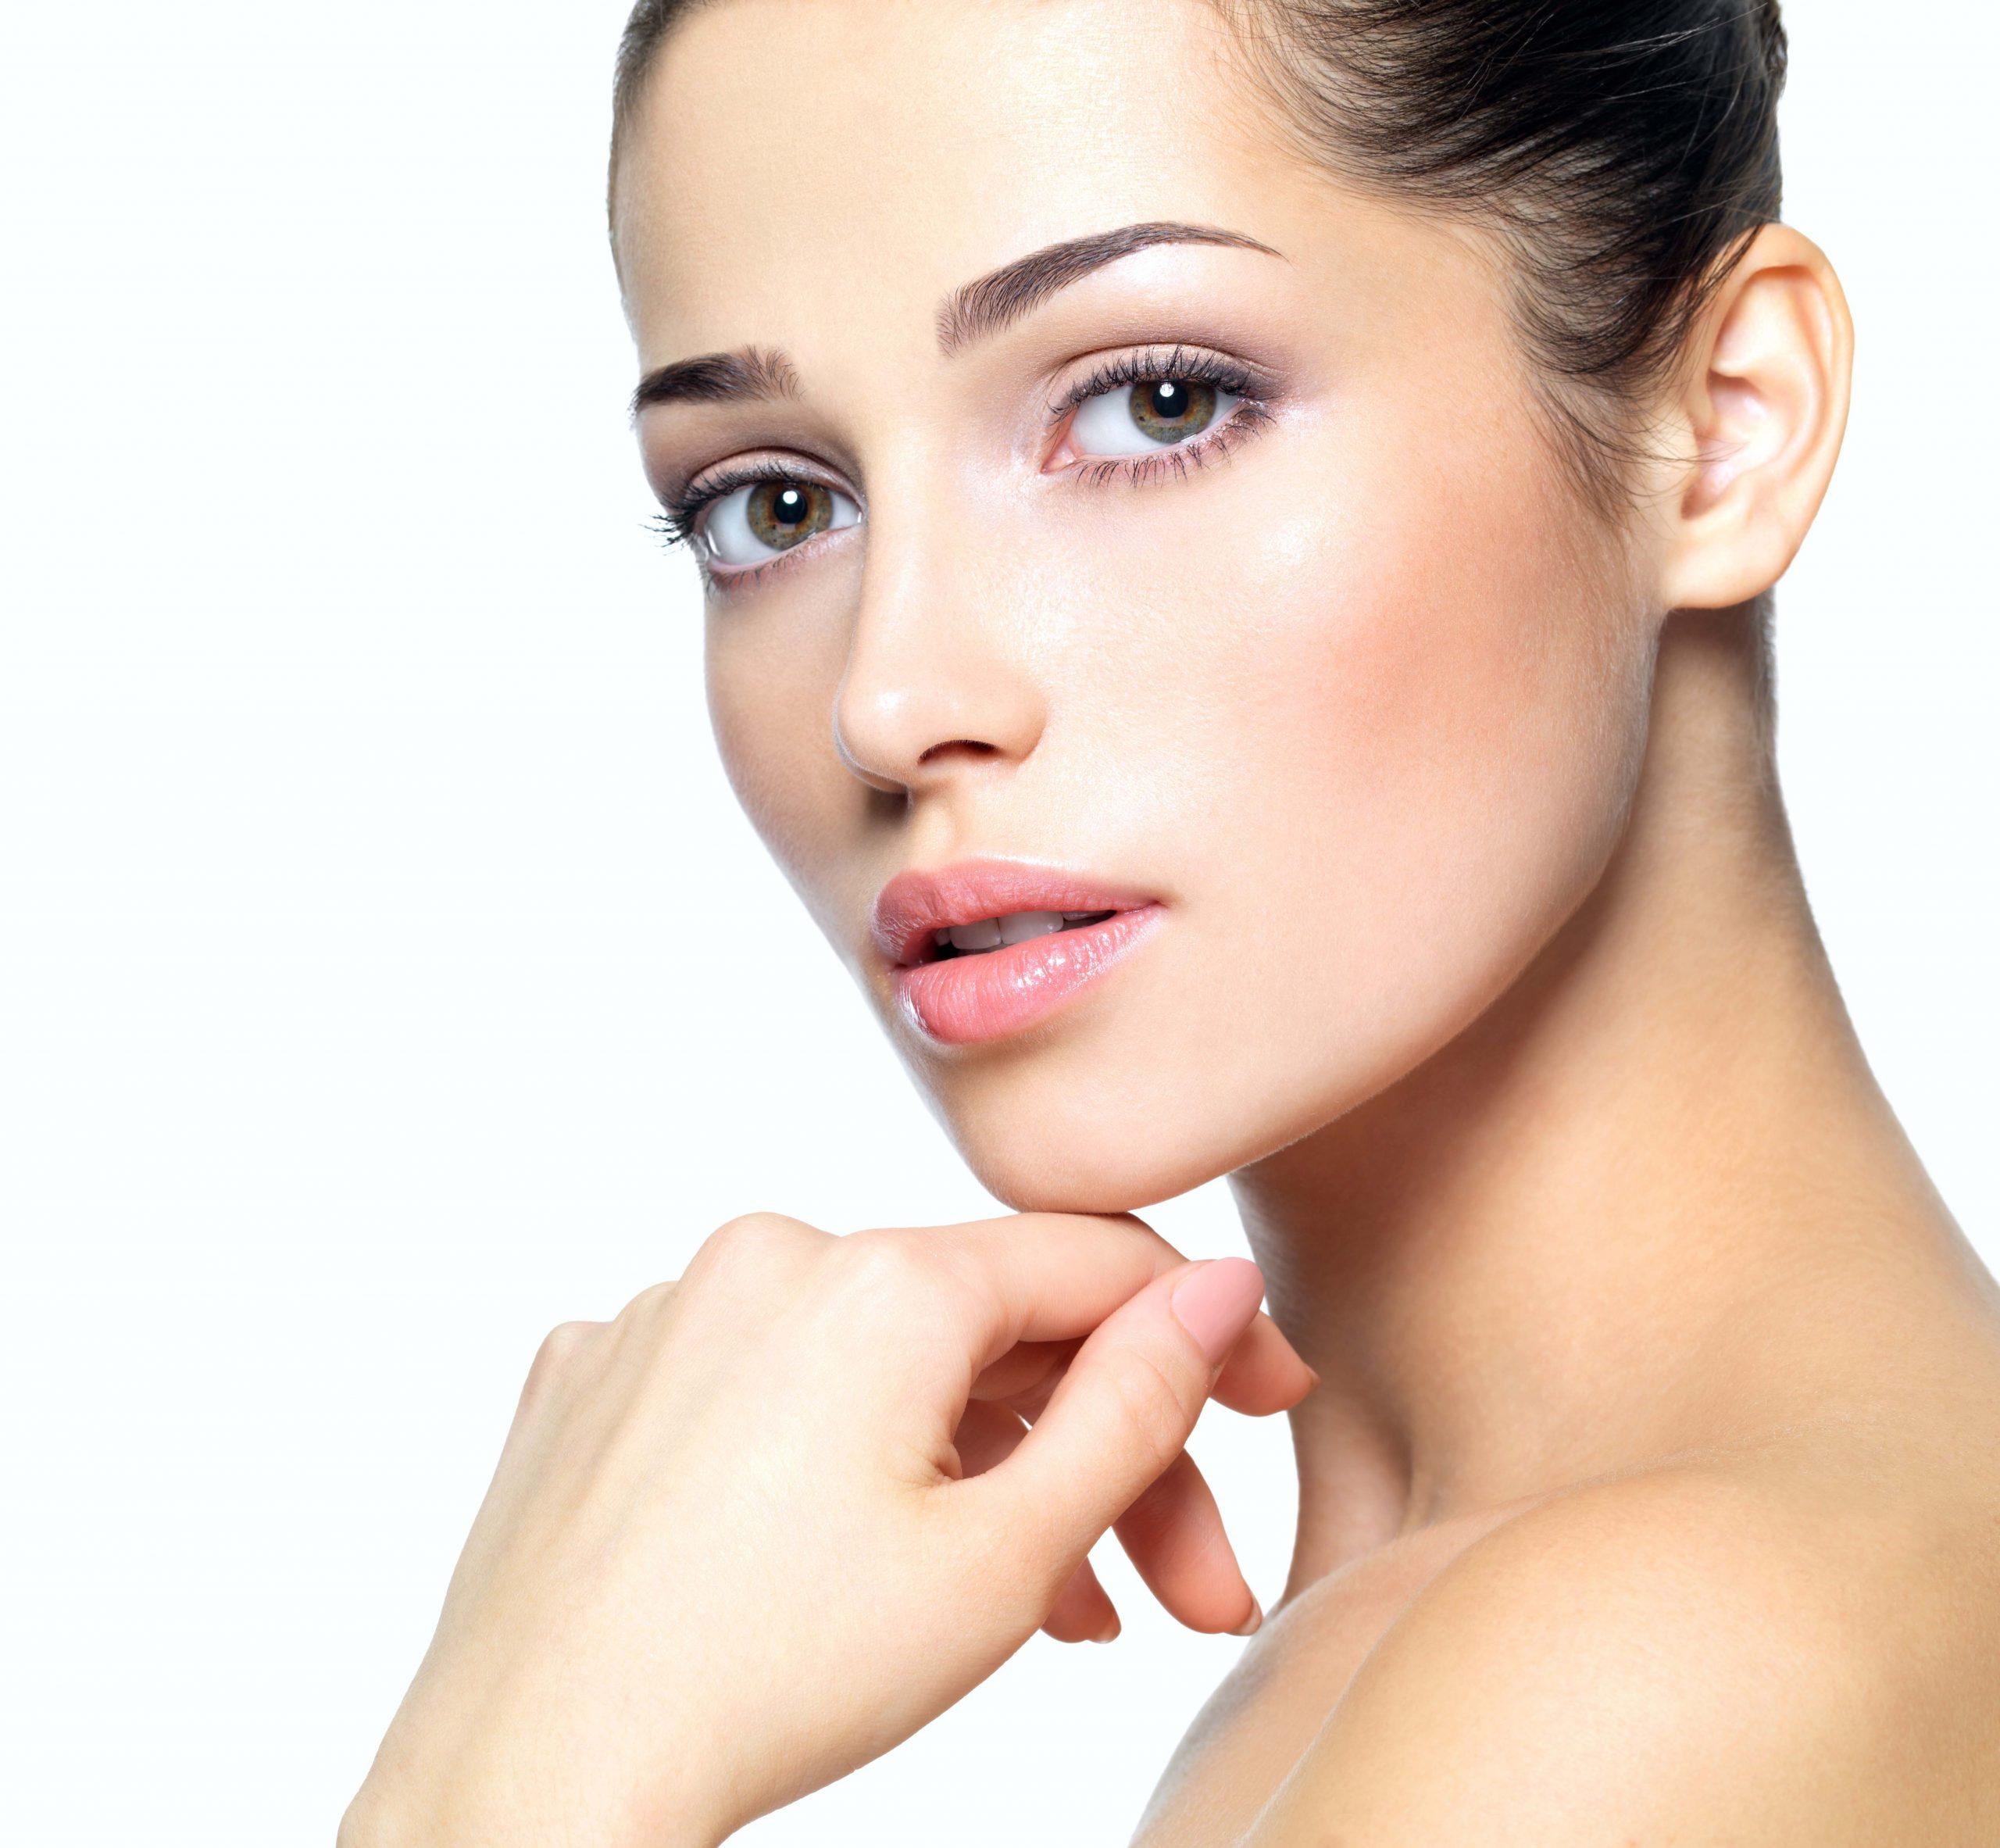 Top 5 Reasons for A Facial Fat Transfer